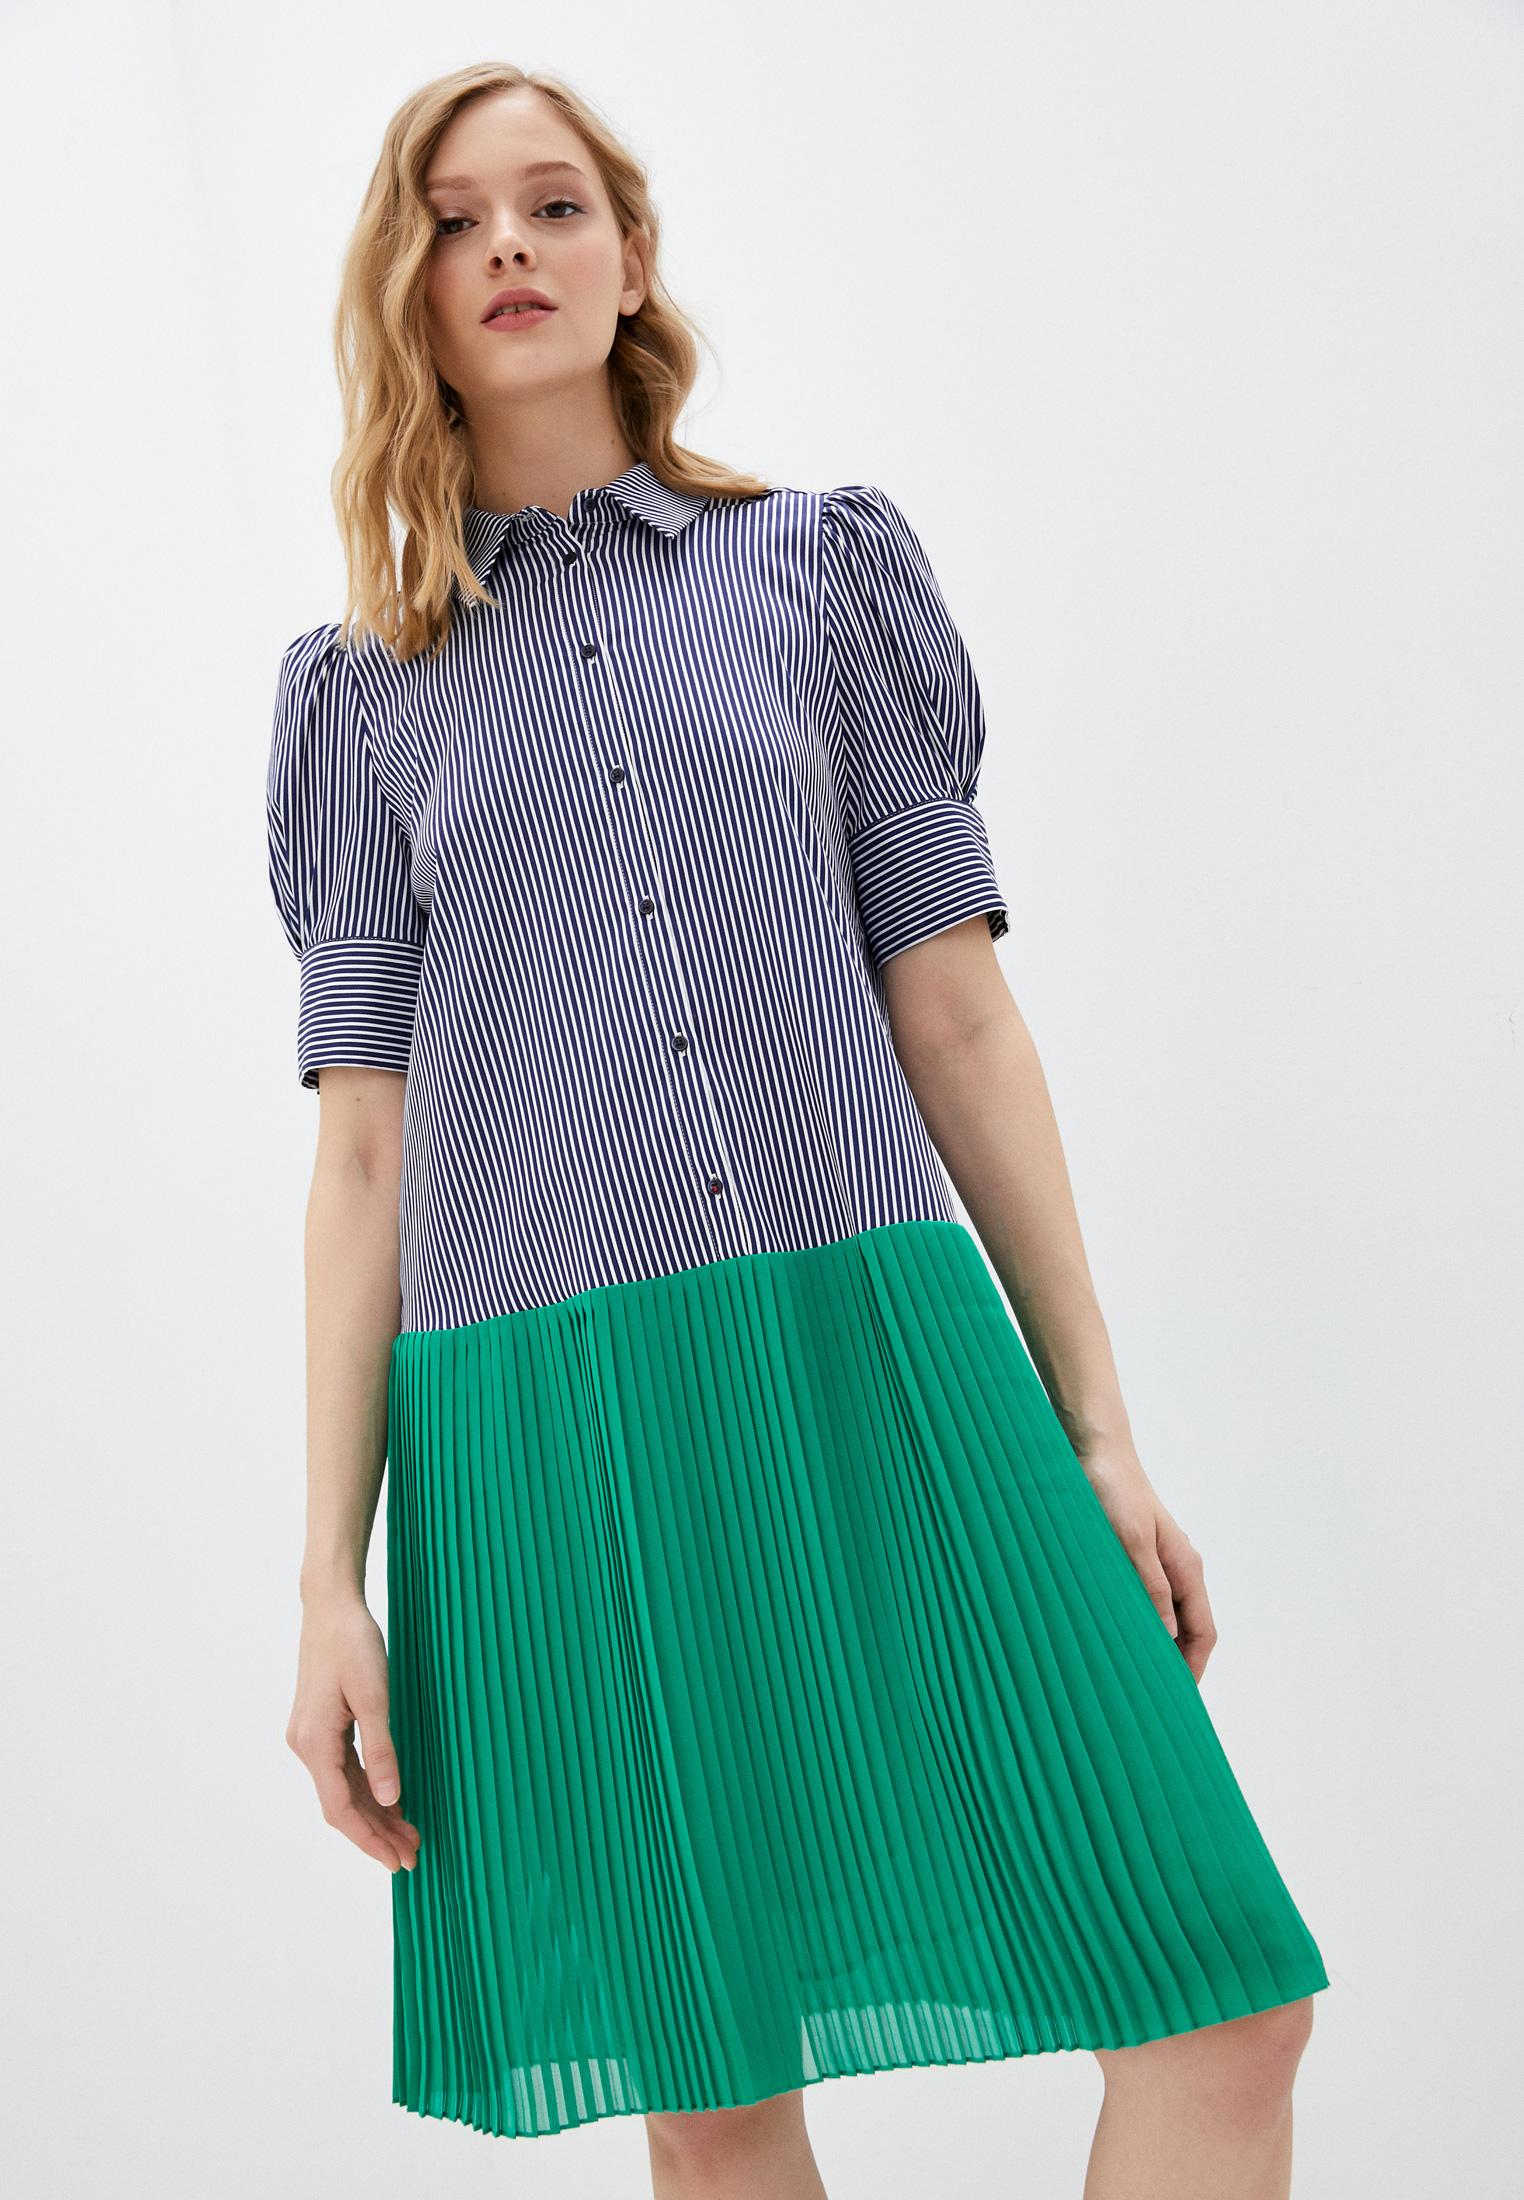 Платье Tommy Hilfiger (Томми Хилфигер) WW0WW30694: изображение 1